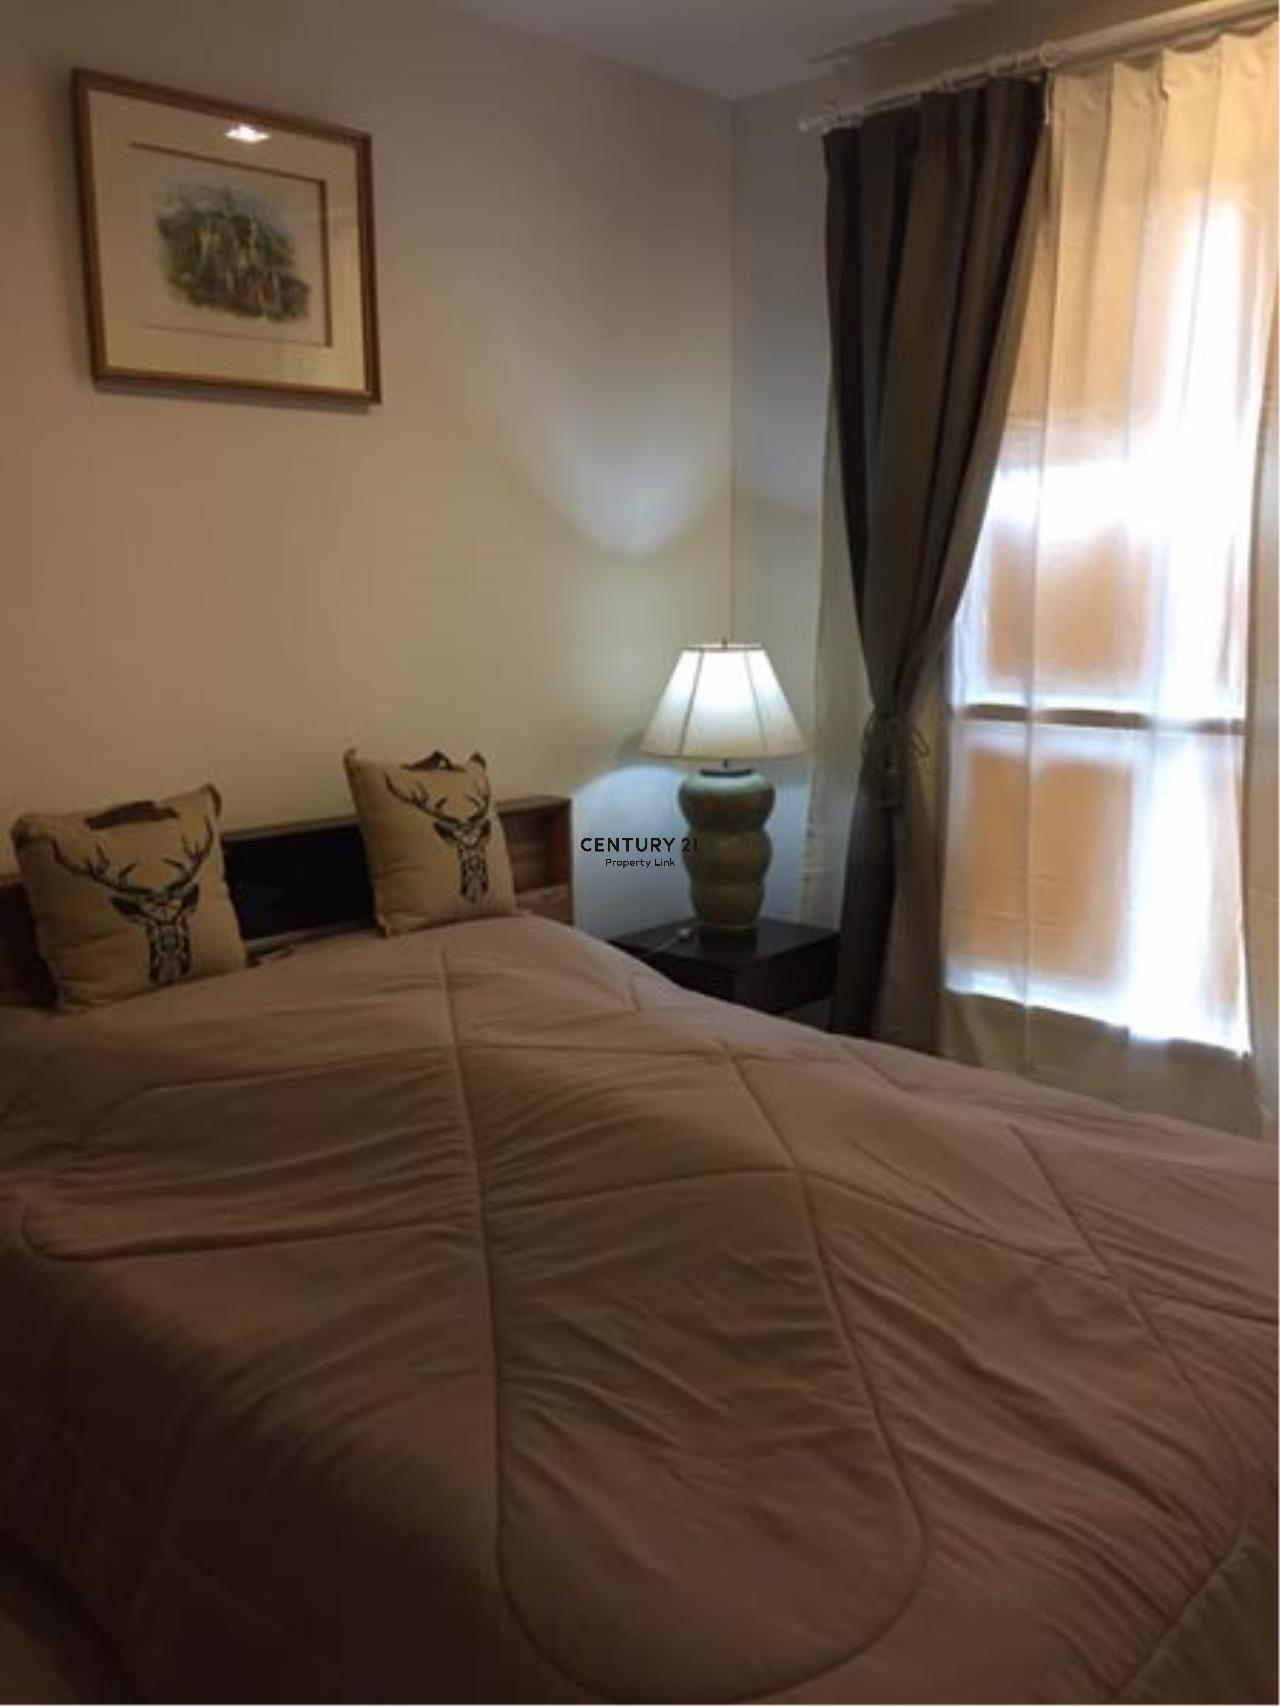 Century21 Property Link Agency's 39-CC-61588 Life Sukhumvit 48 Room For Rent Near BTS Phra Khanong Sukhumvit Road 1 Bedroom 17,000 THB./ Month 4